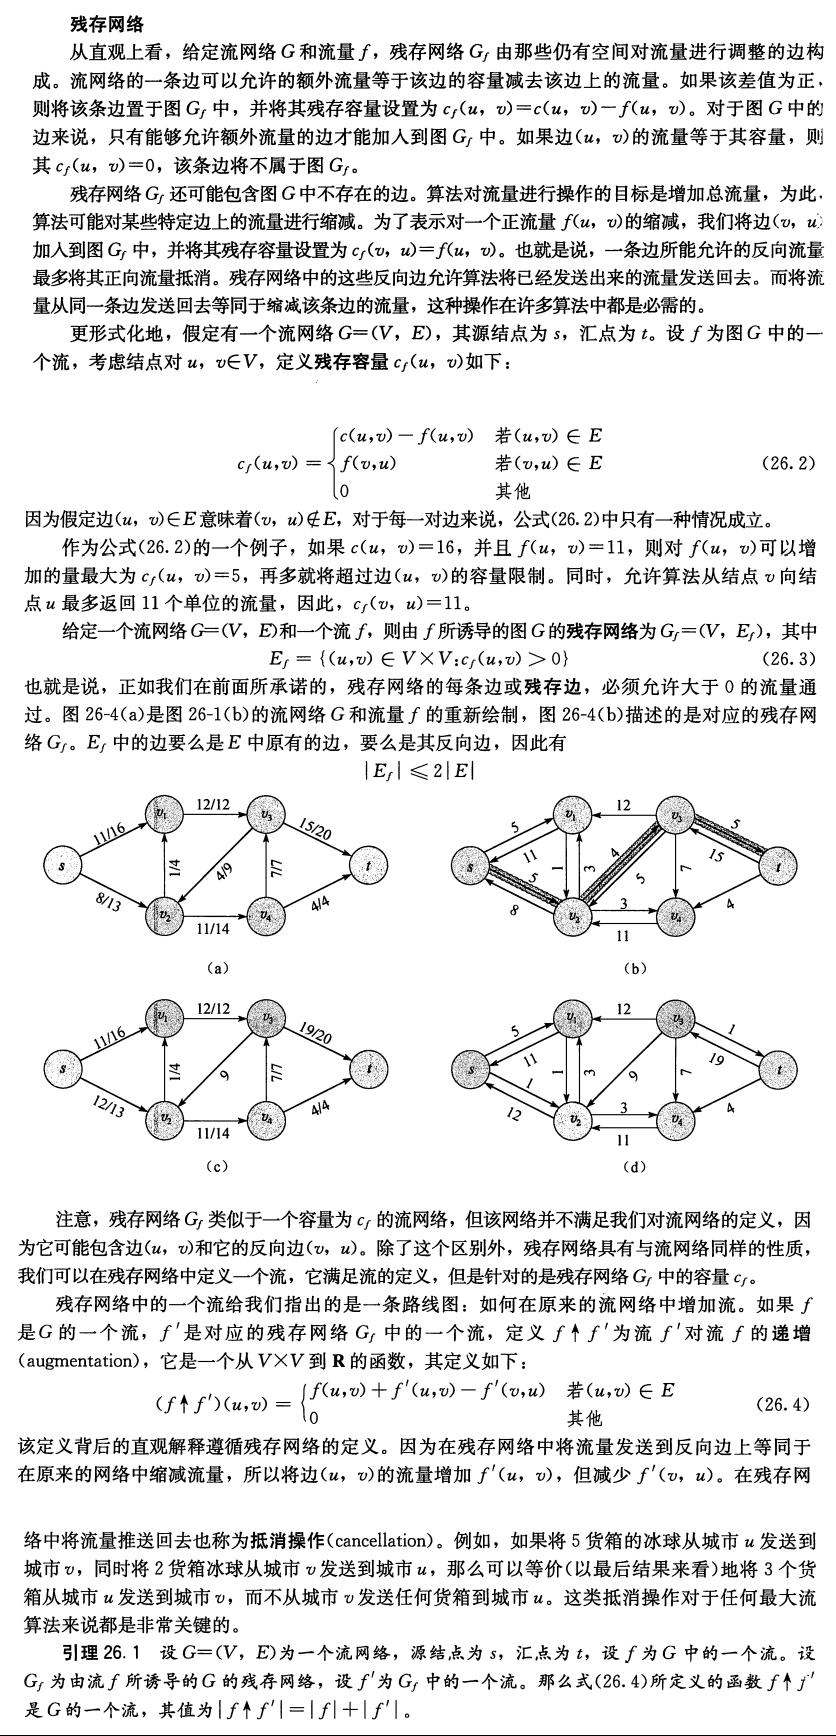 graph-7